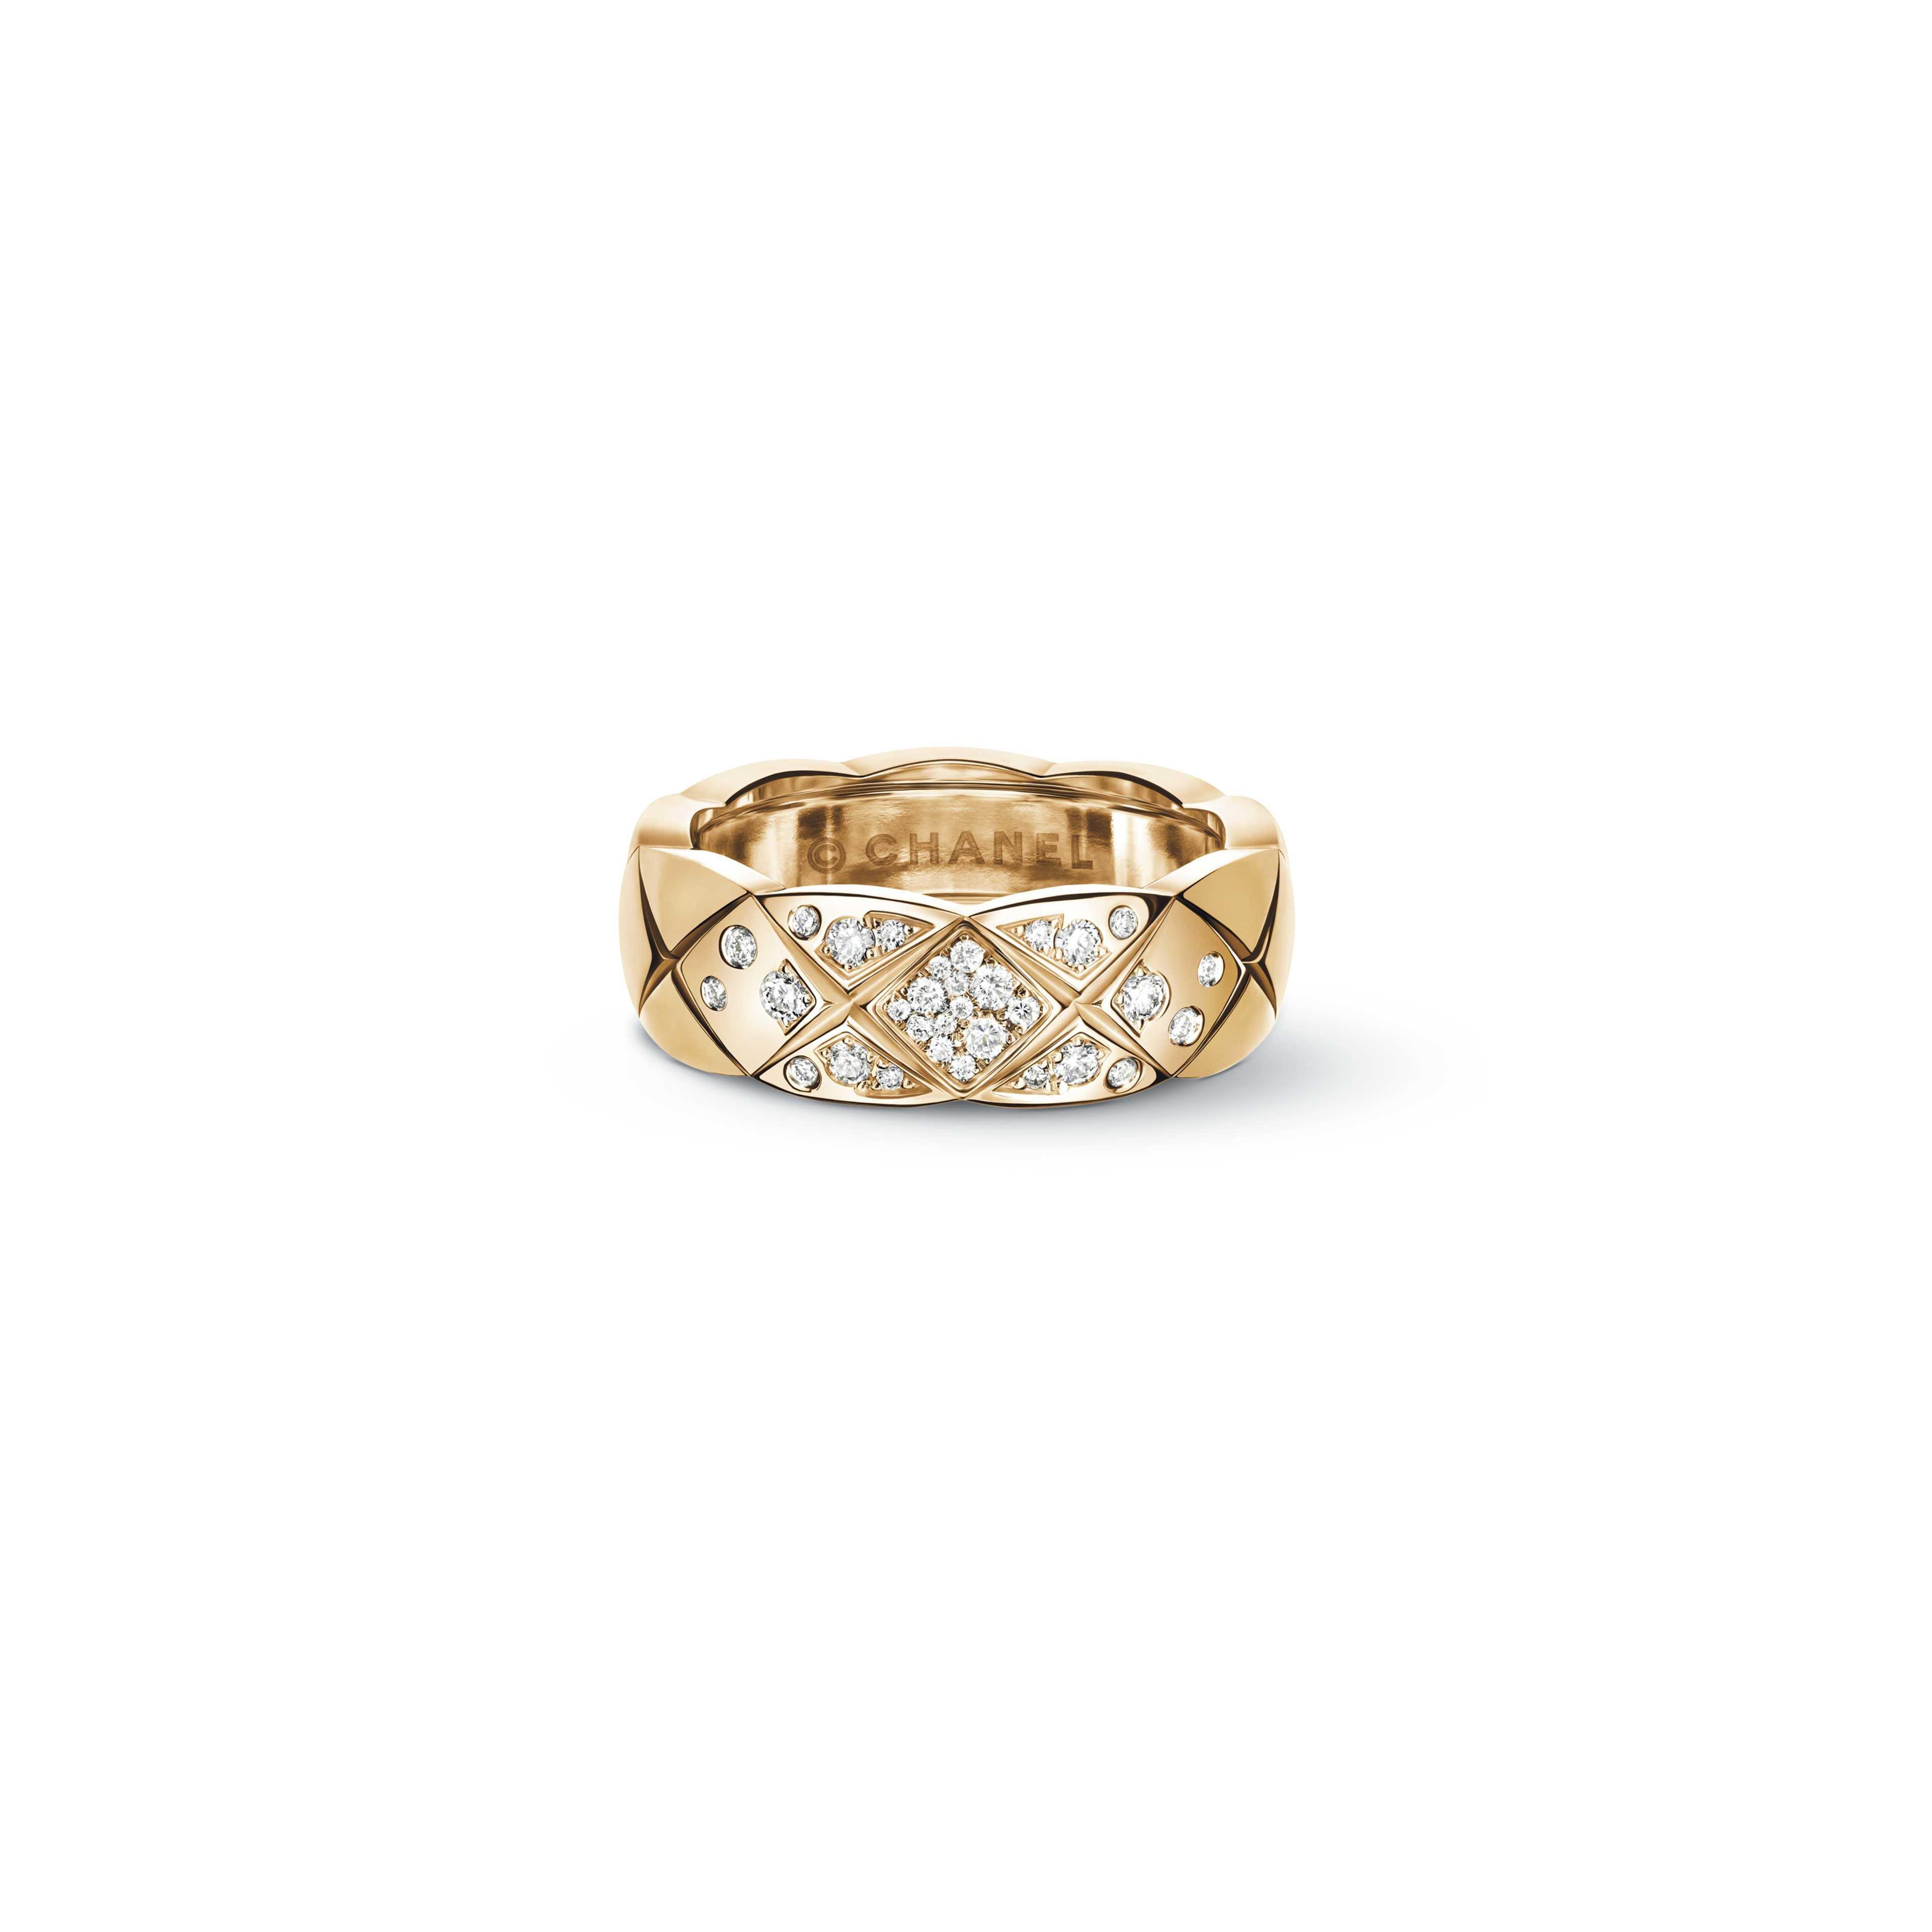 Coco Crush ring - J11101 | CHANEL